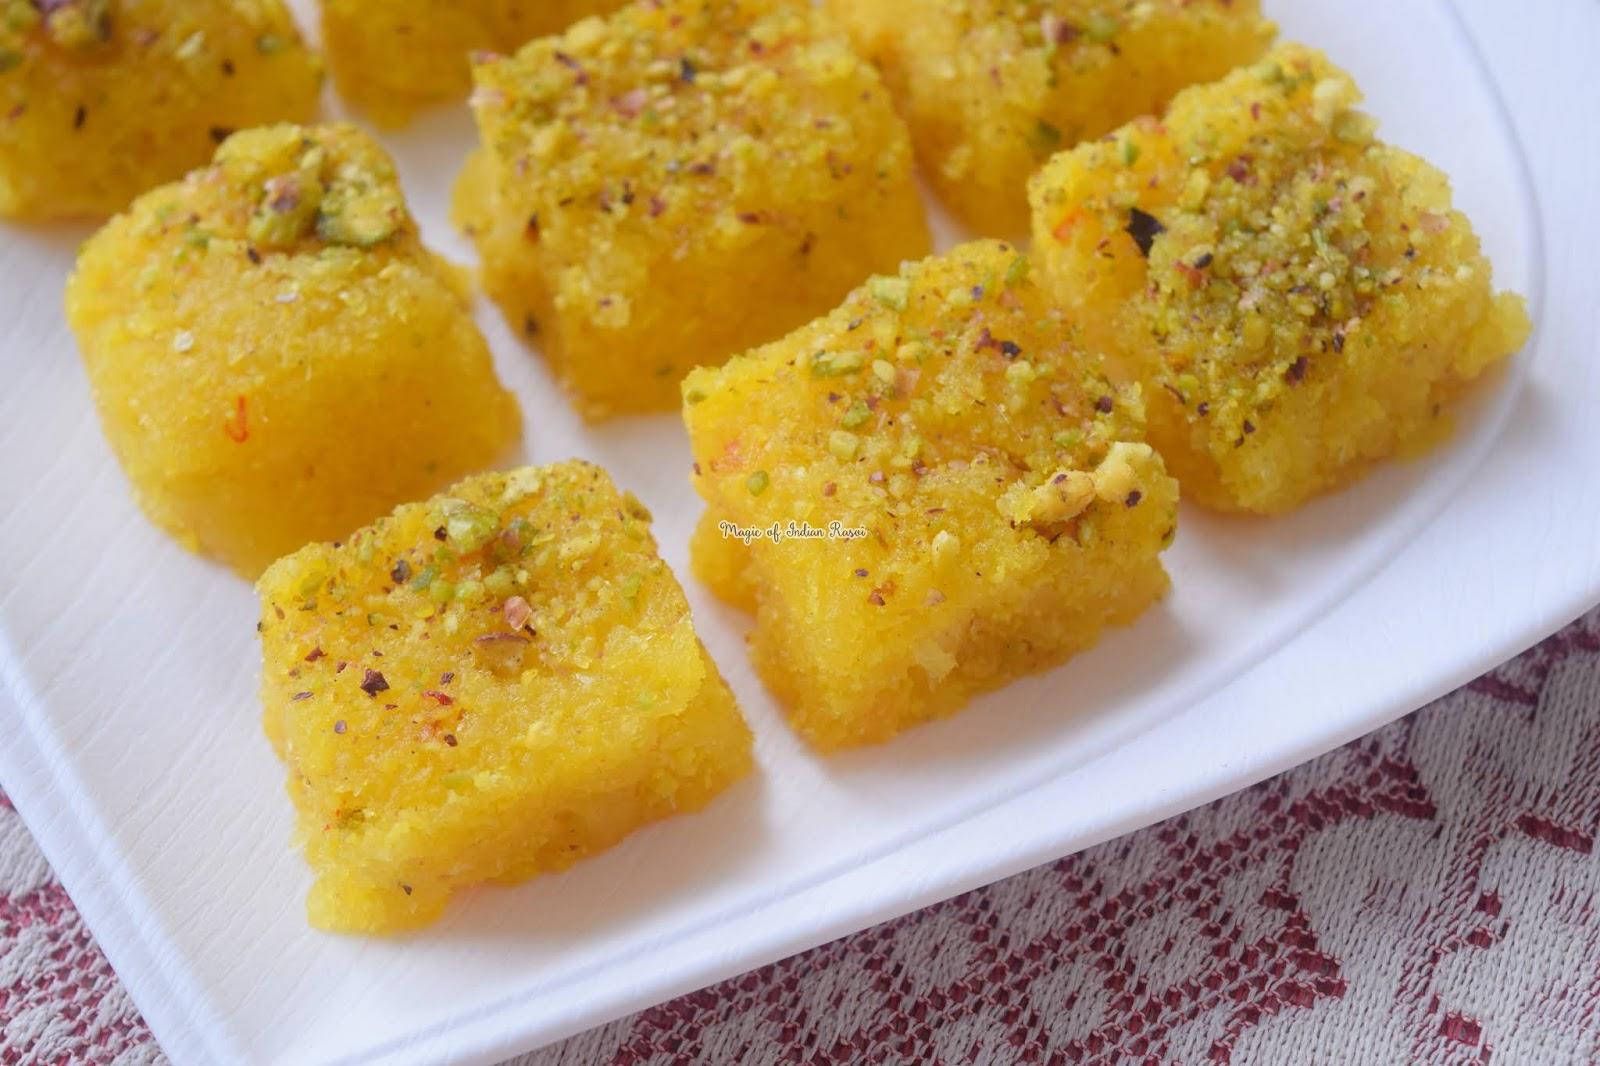 Fresh Coconut Kesar Barfi Recipe - Kesar Mawa Kopra Pak  - ताजा नारियल केसर बर्फी रेसिपी - Priya R - Magic of Indian Rasoi